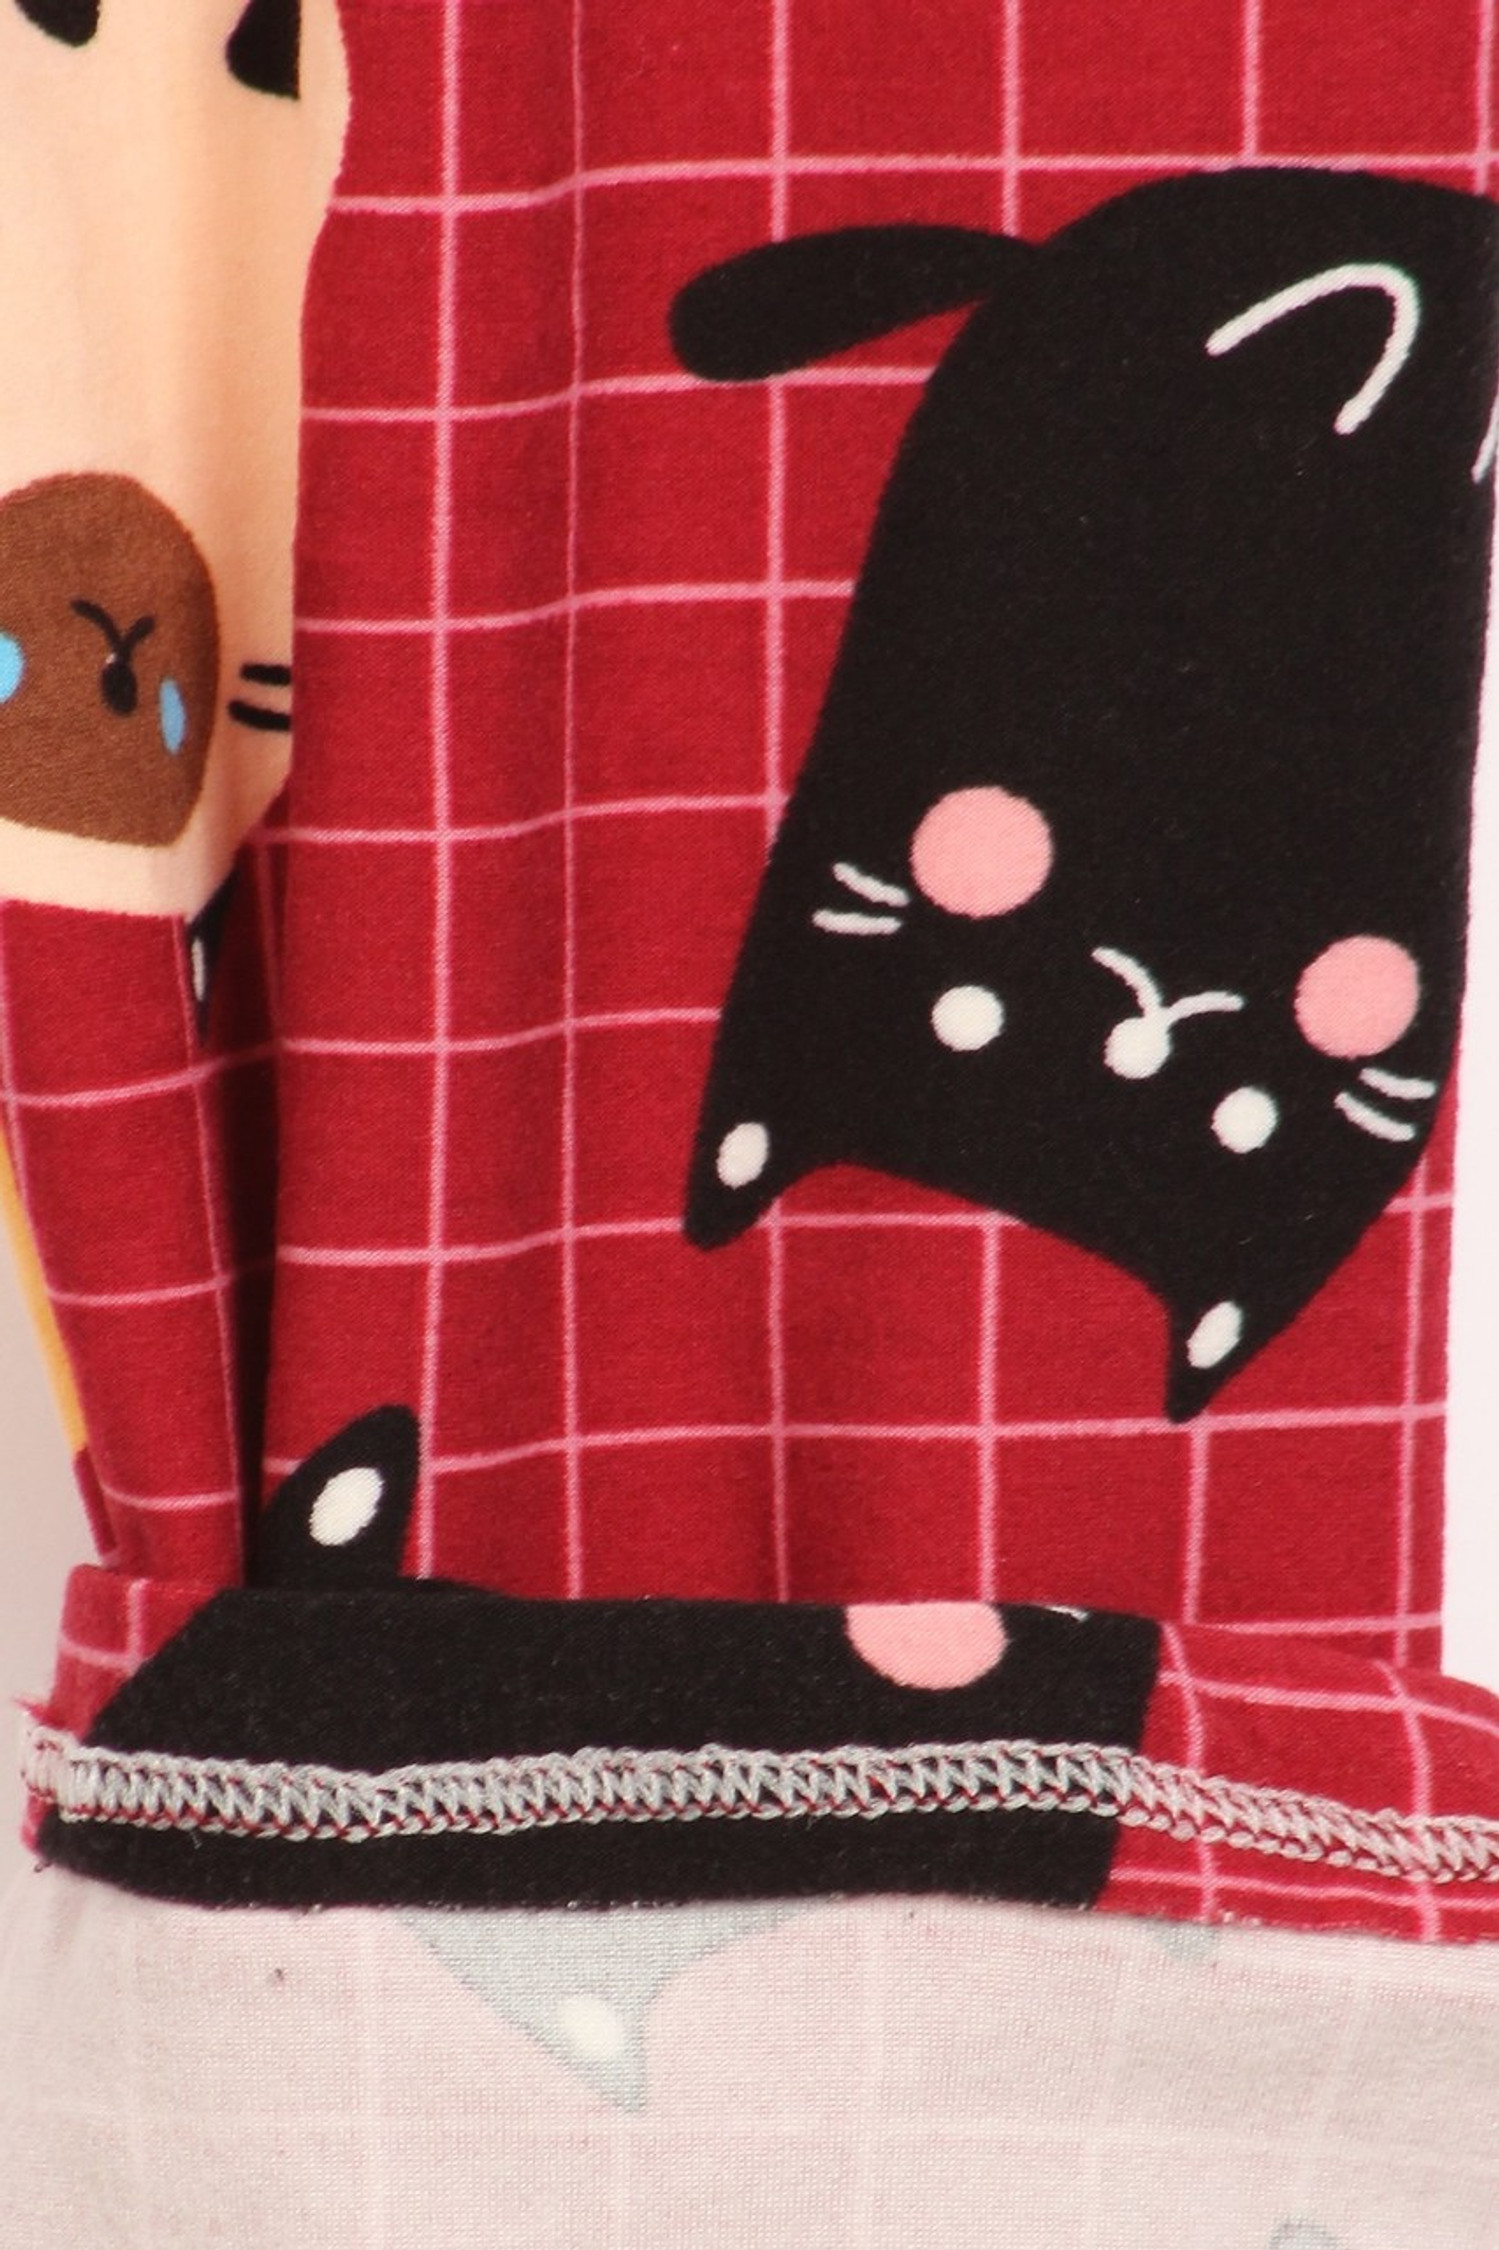 Brushed Cartoon Kitty Cats Leggings